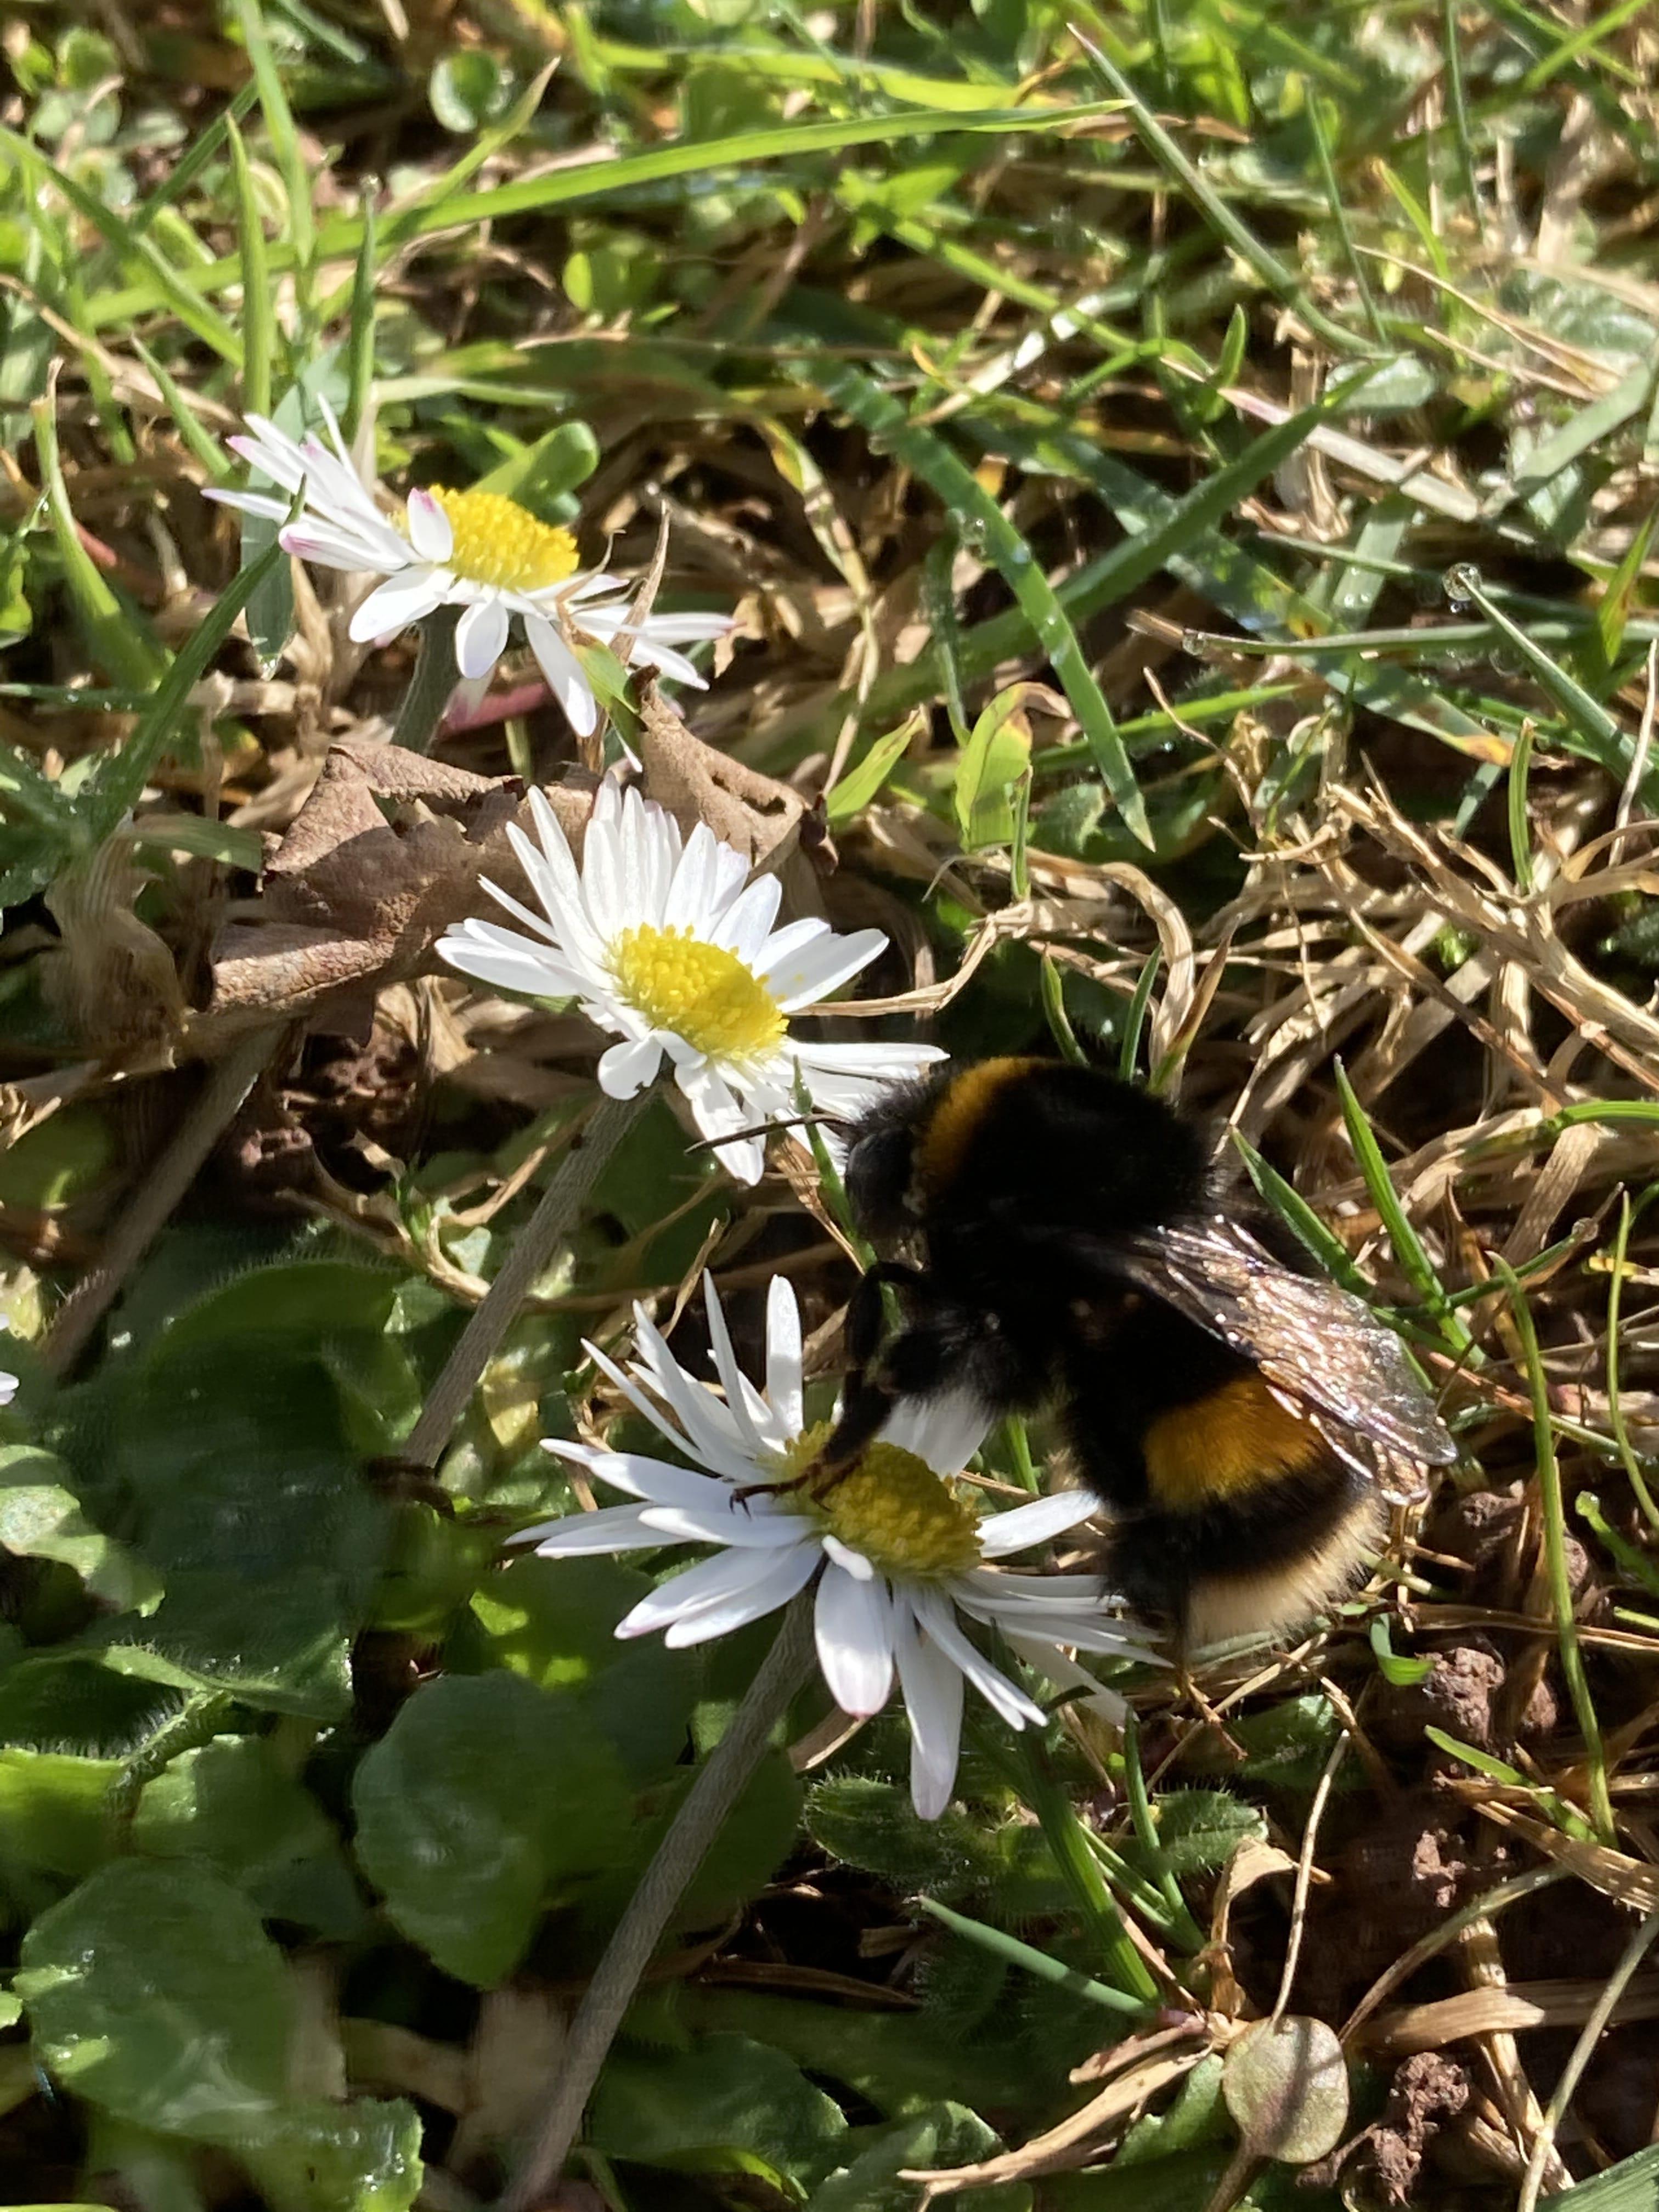 Wild bee on flowers